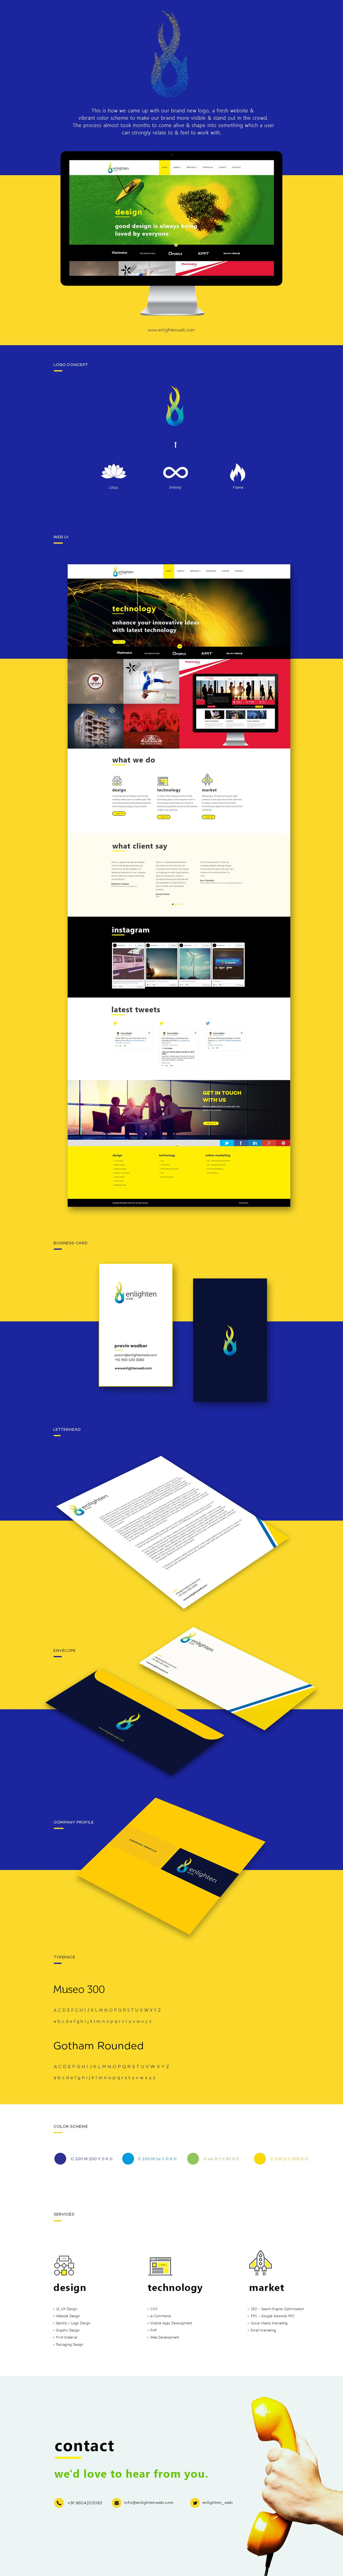 Logo Design identity brand kit